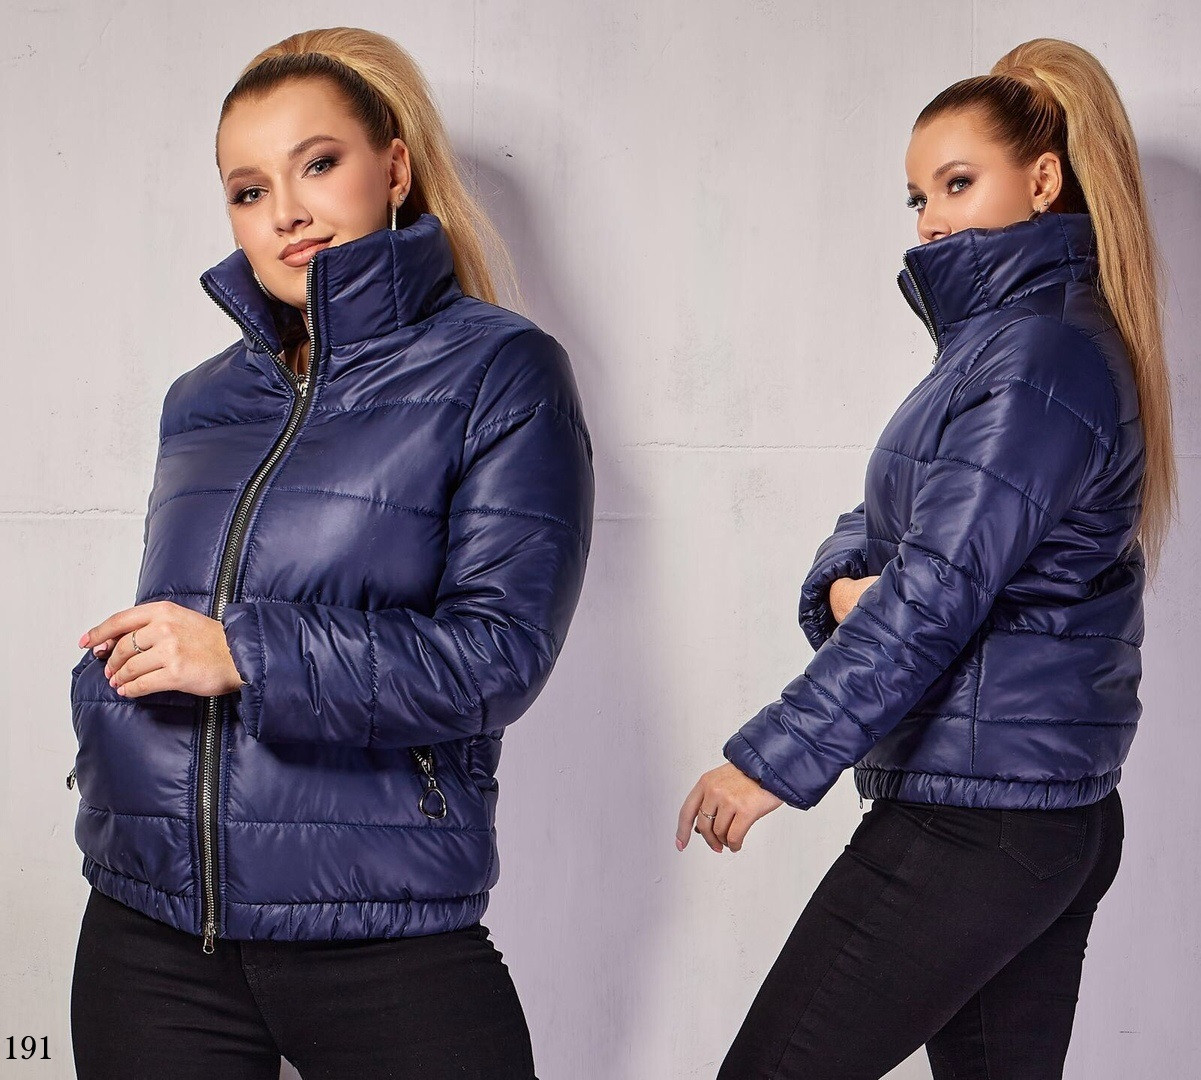 Куртка короткая стойка весна 100 синтепон плащевка 48-50,52-54,56-58